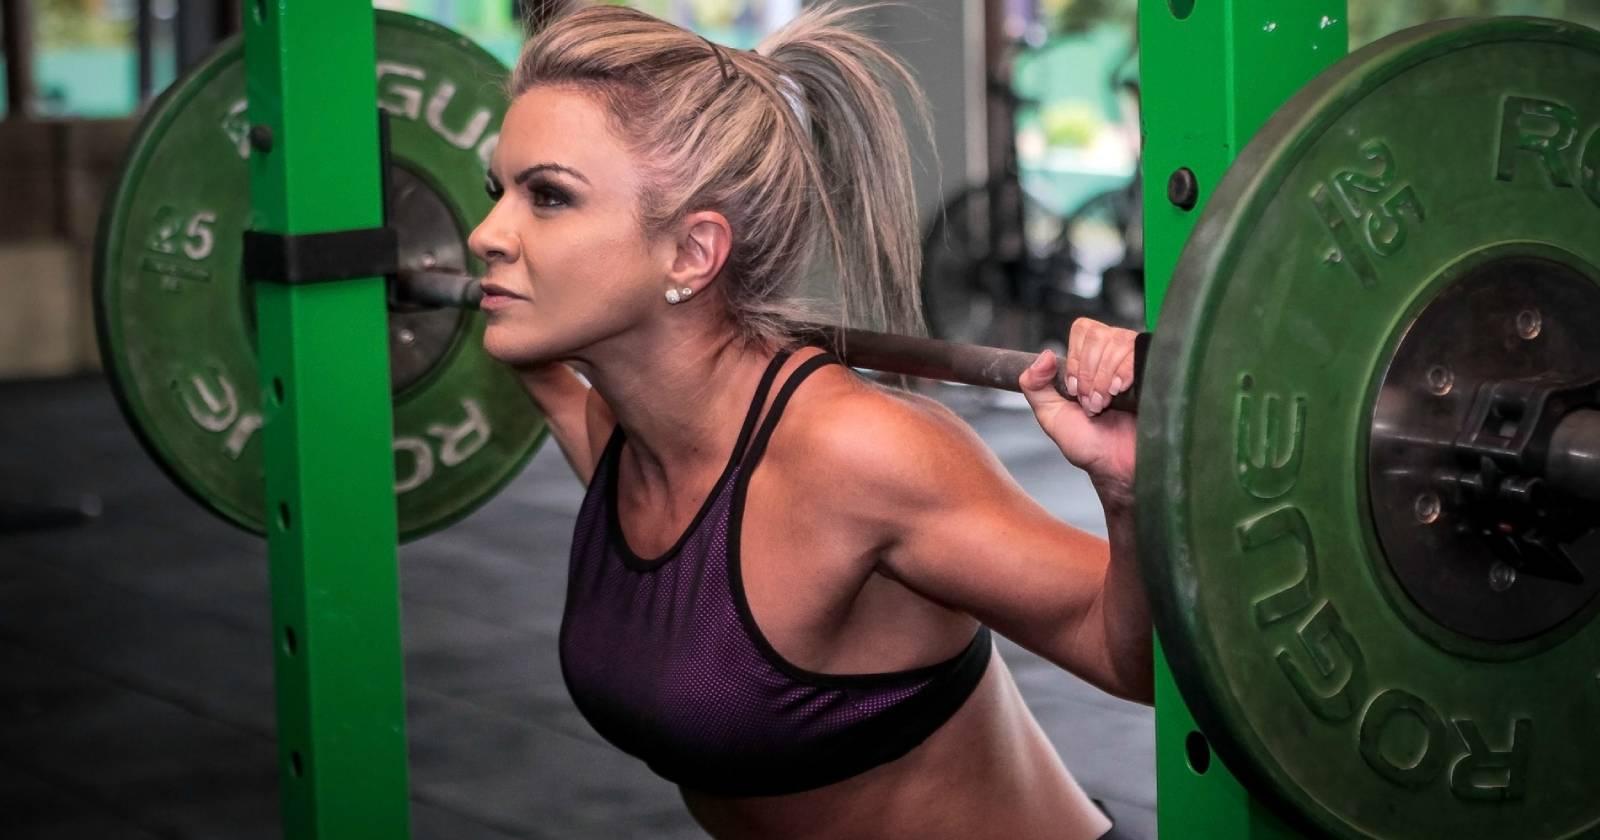 Größere brustmuskel brust frau trainieren Brust vergrößern